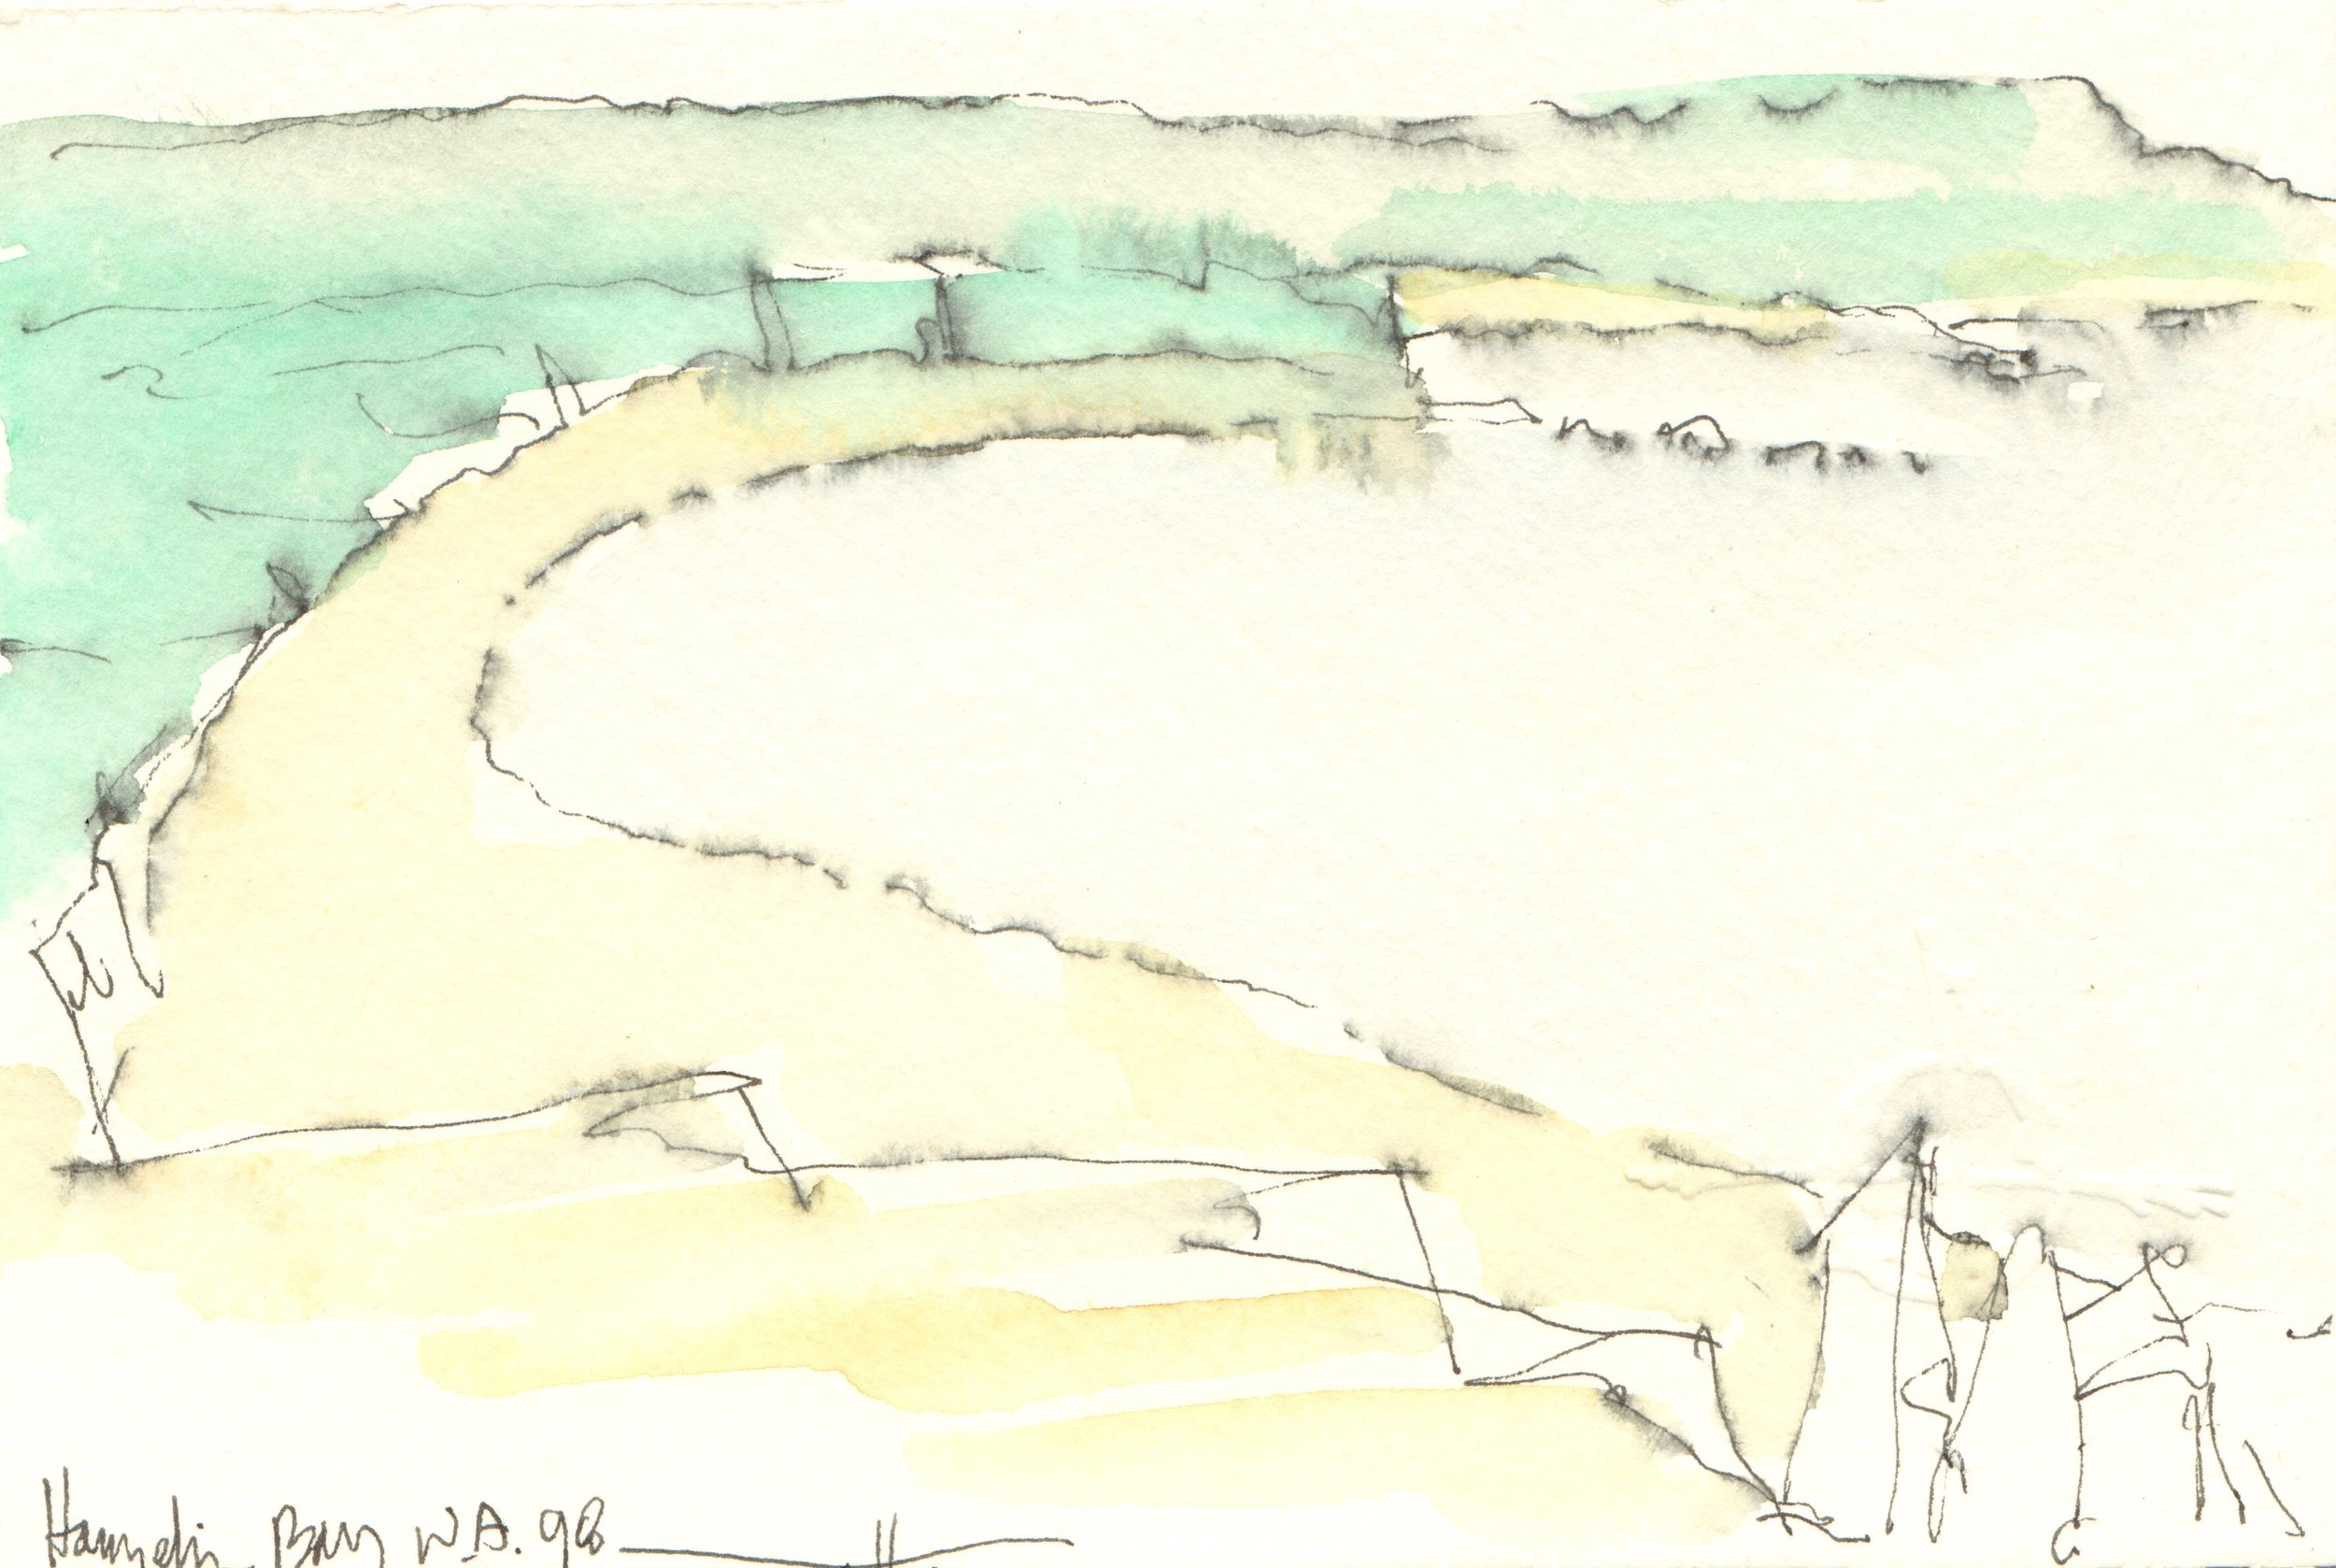 Hamelin Bay 3, W.A. 98-181211-0007.jpg